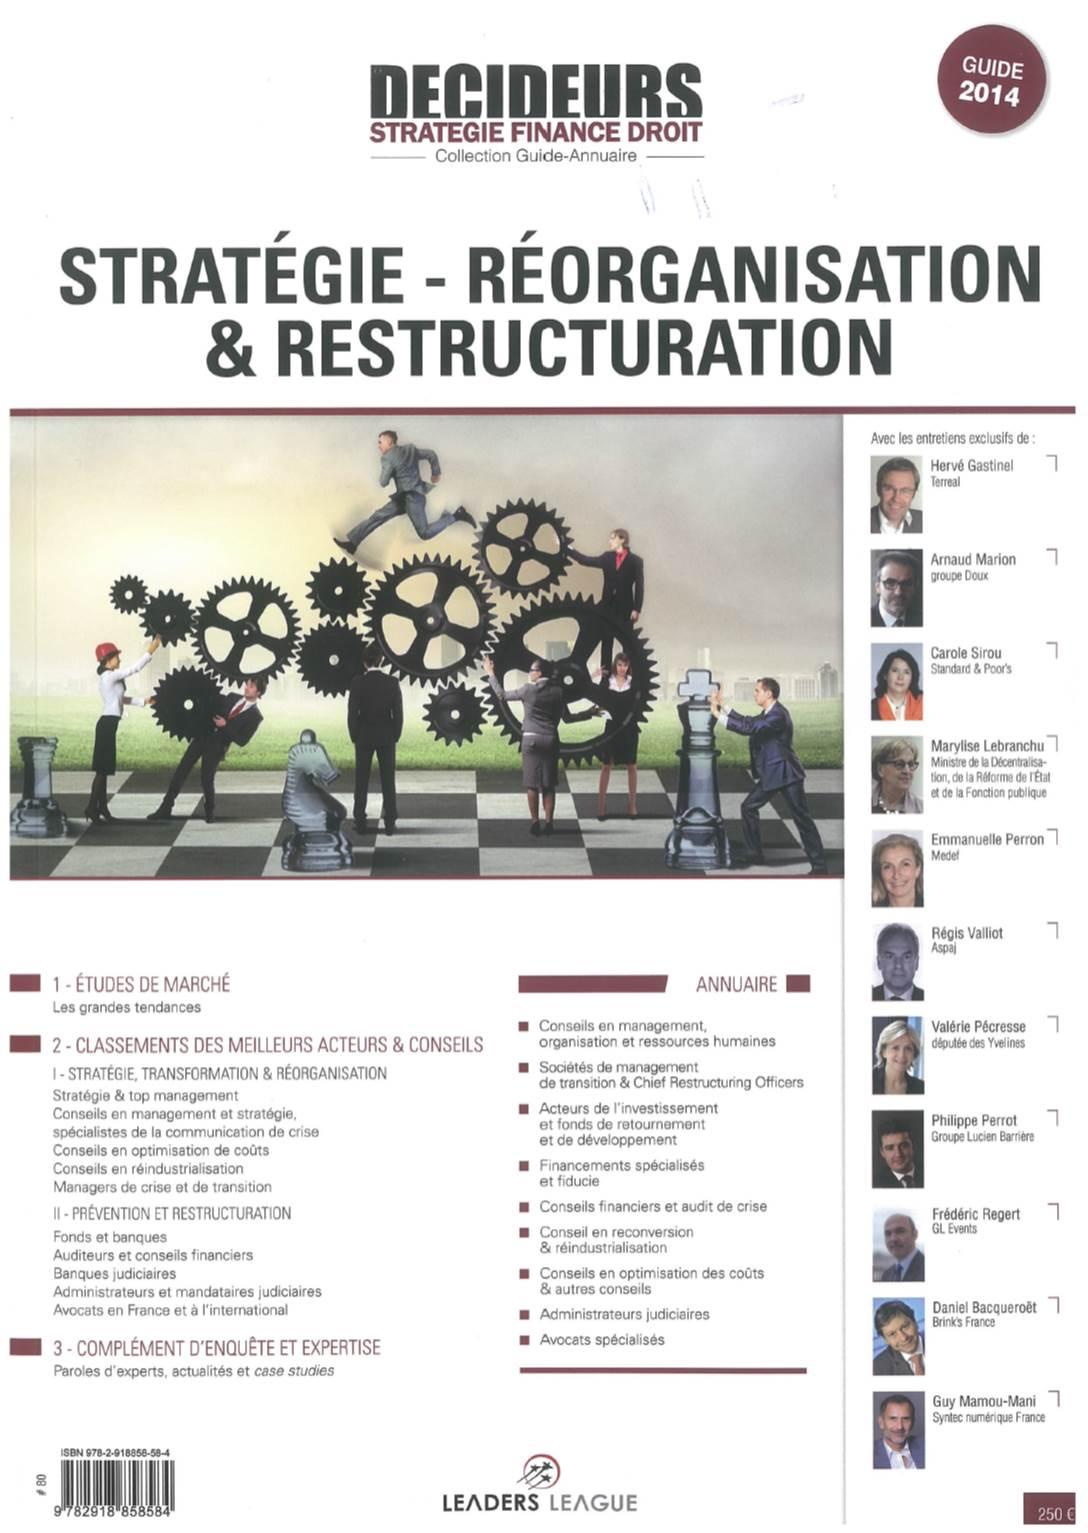 74.CouvertureDecideursRestructuring2014